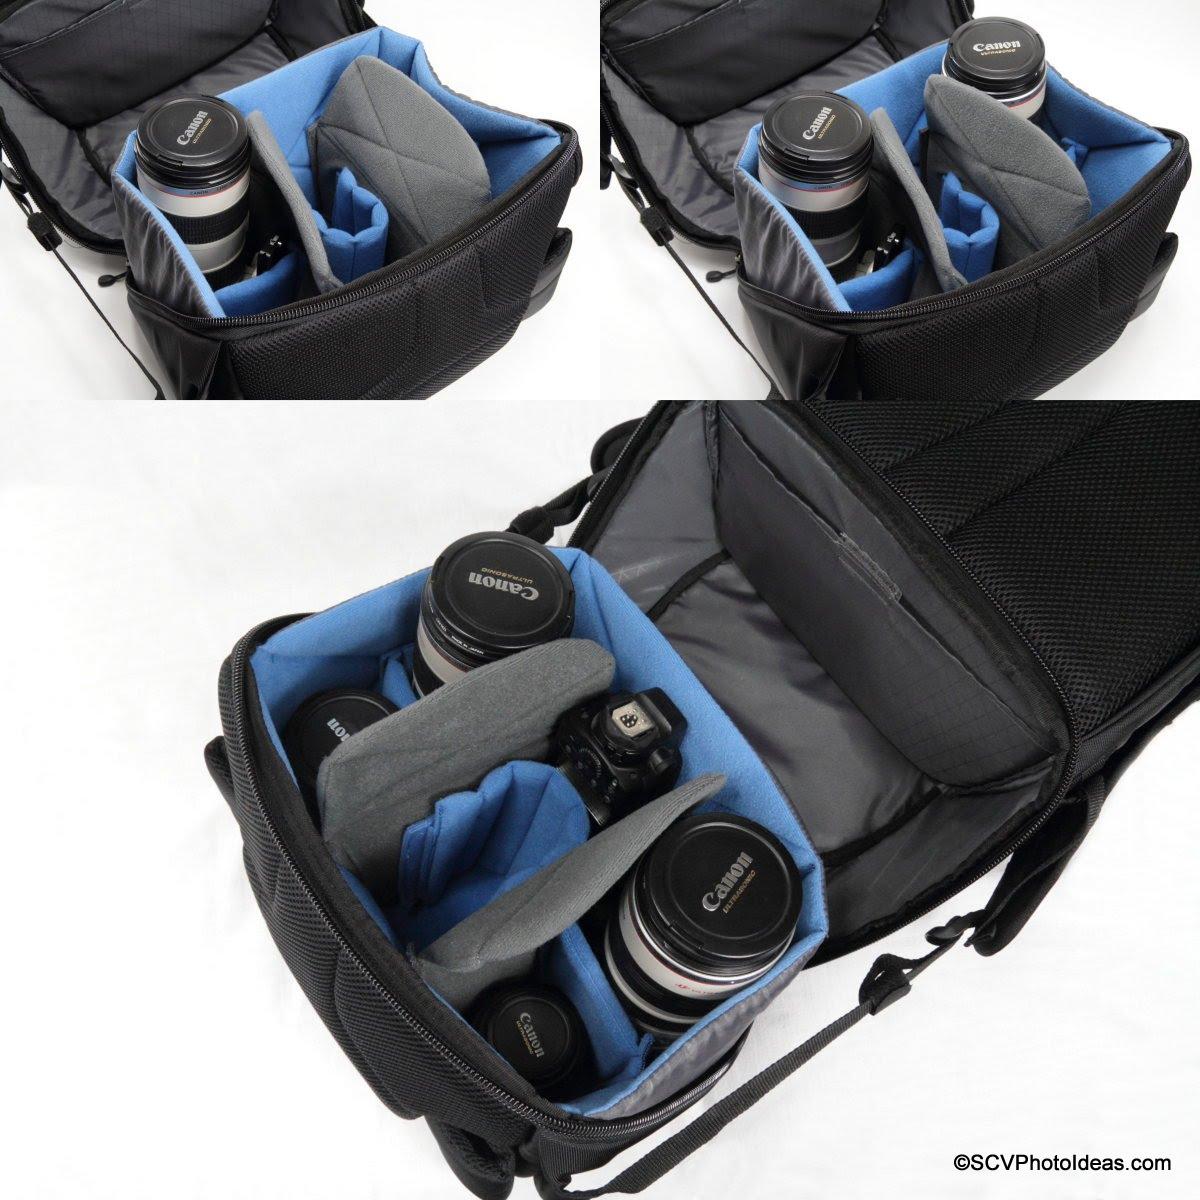 Case Logic DSB-103 main compartment configuration options